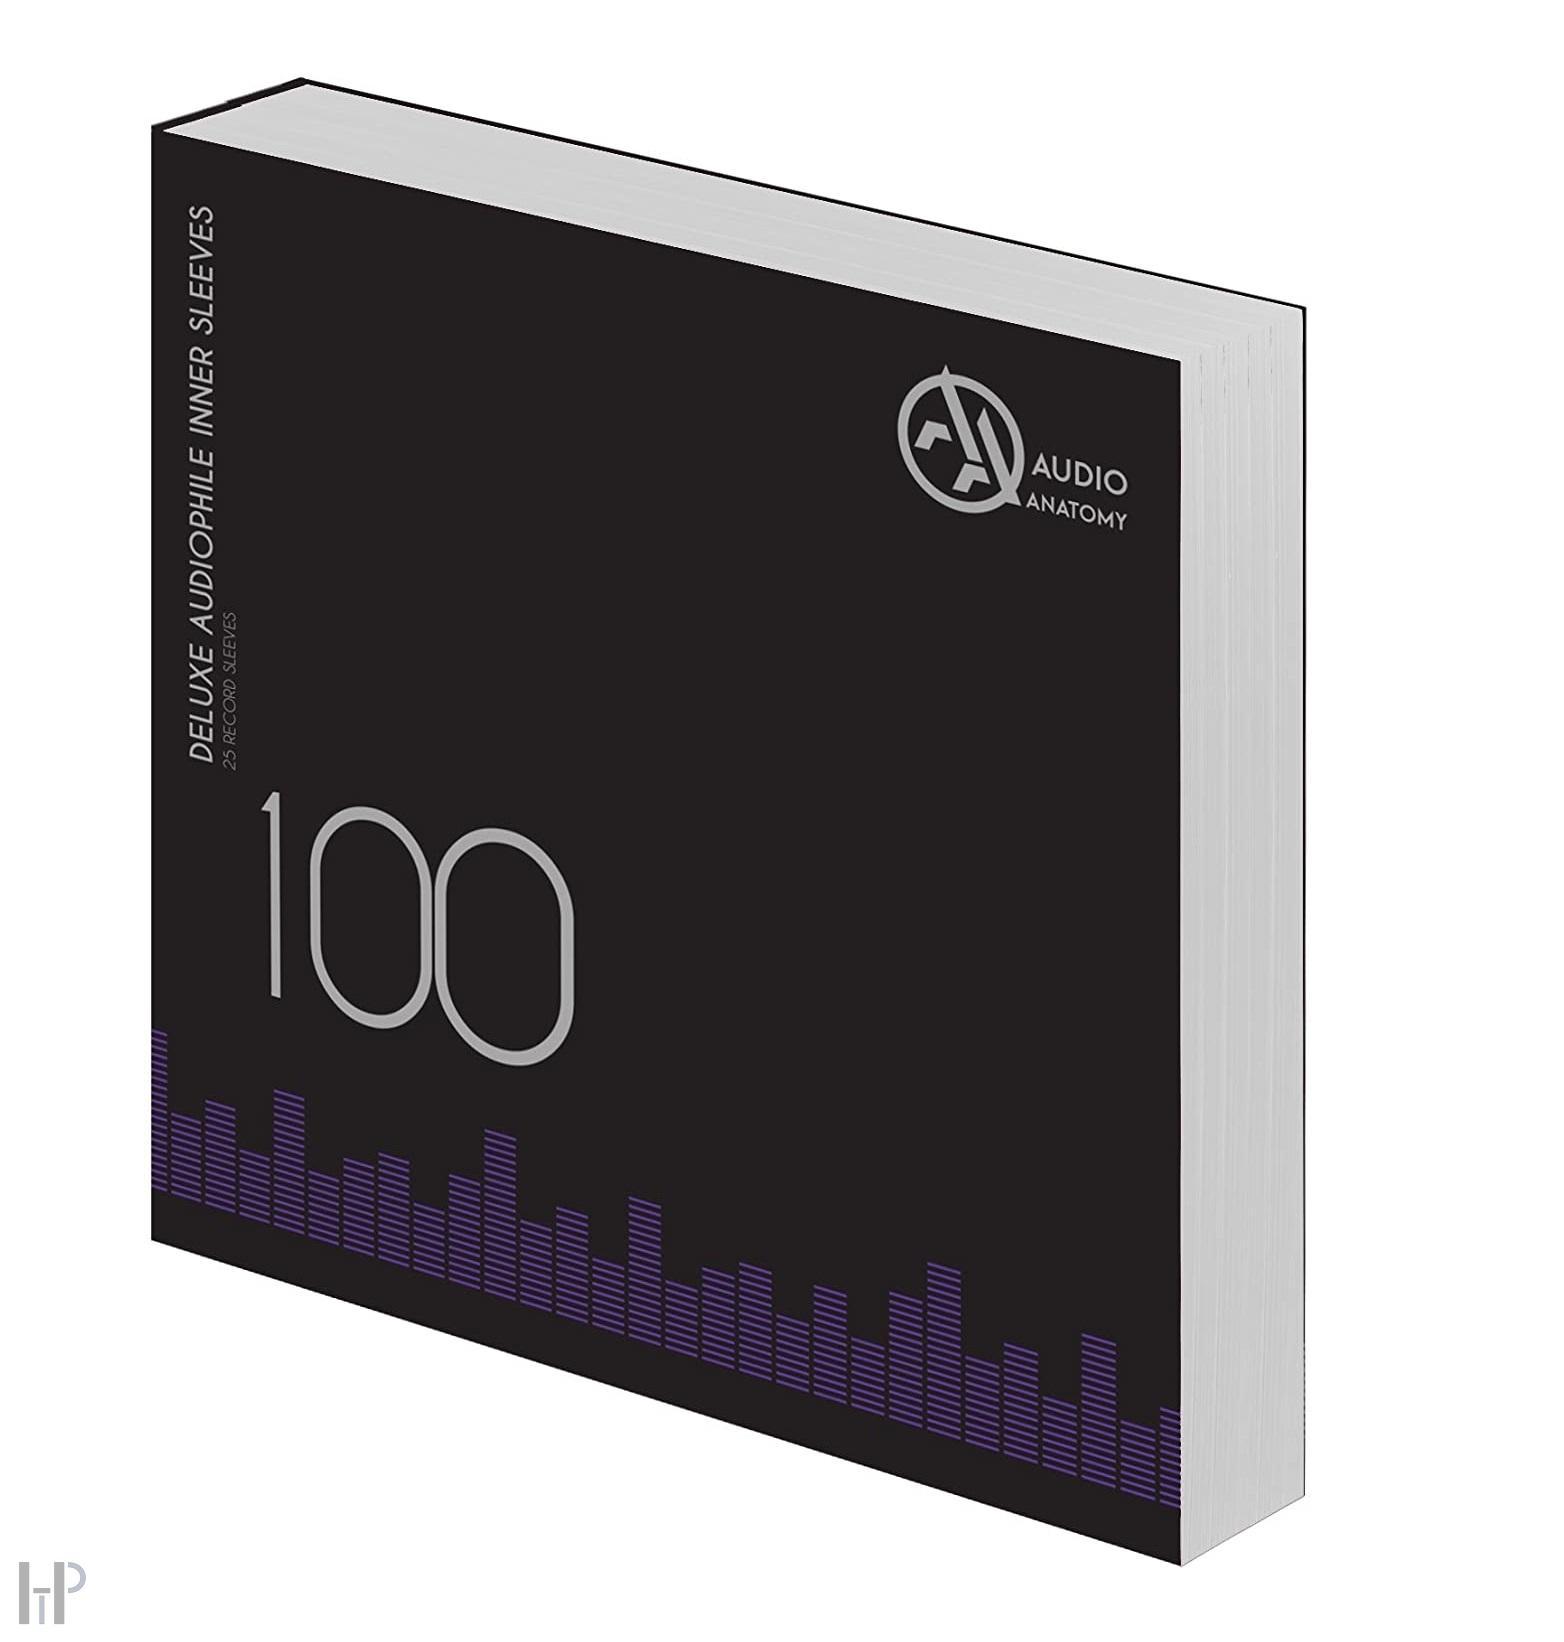 Audio Anatomy INNER SLEEVES 12″ Množství: 25 kusů